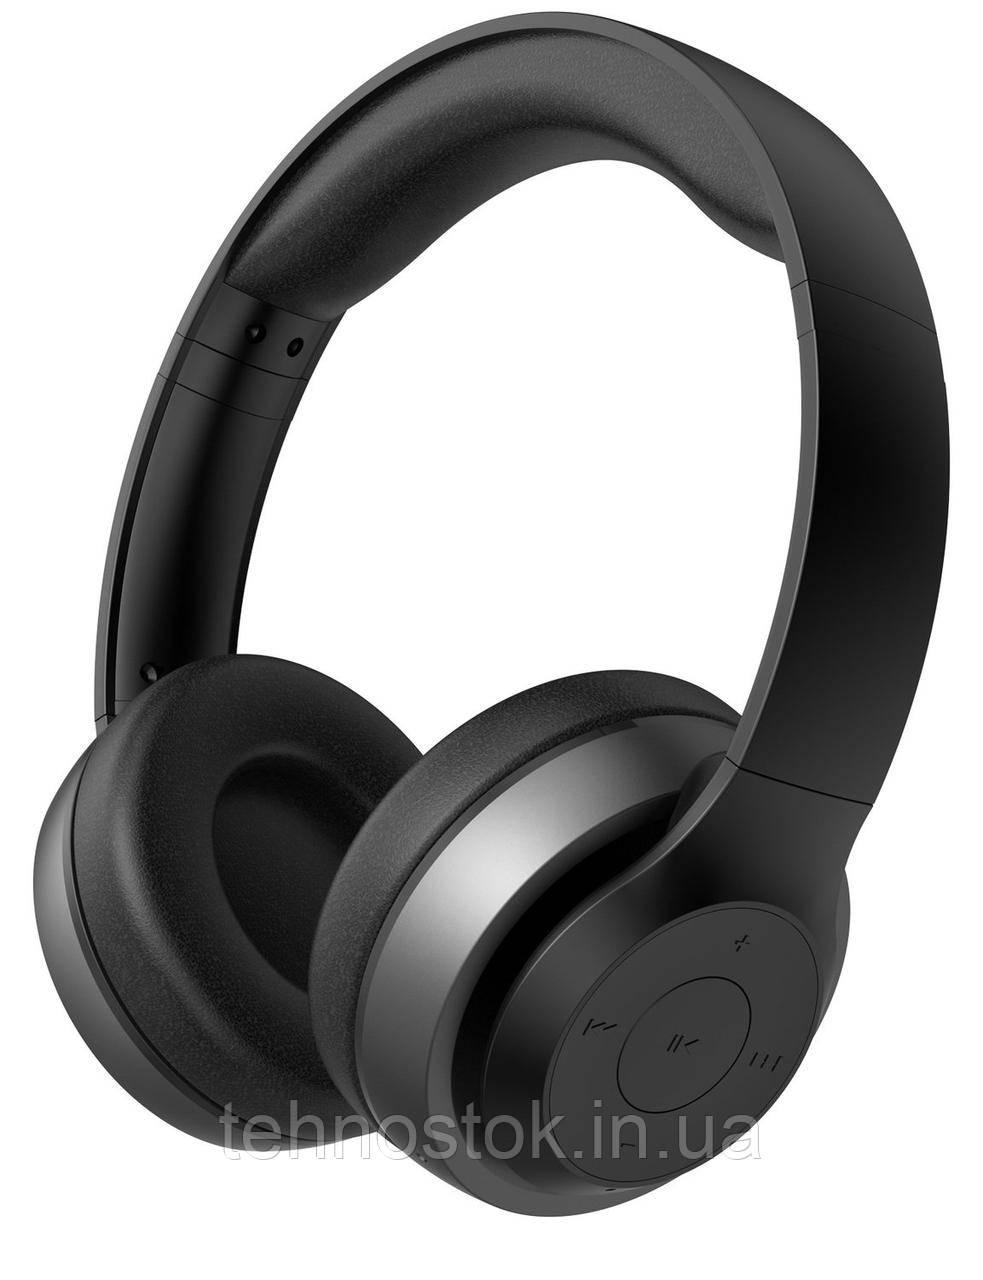 Bluetooth Stereo 2E V3 black Гарантия 1 месяц